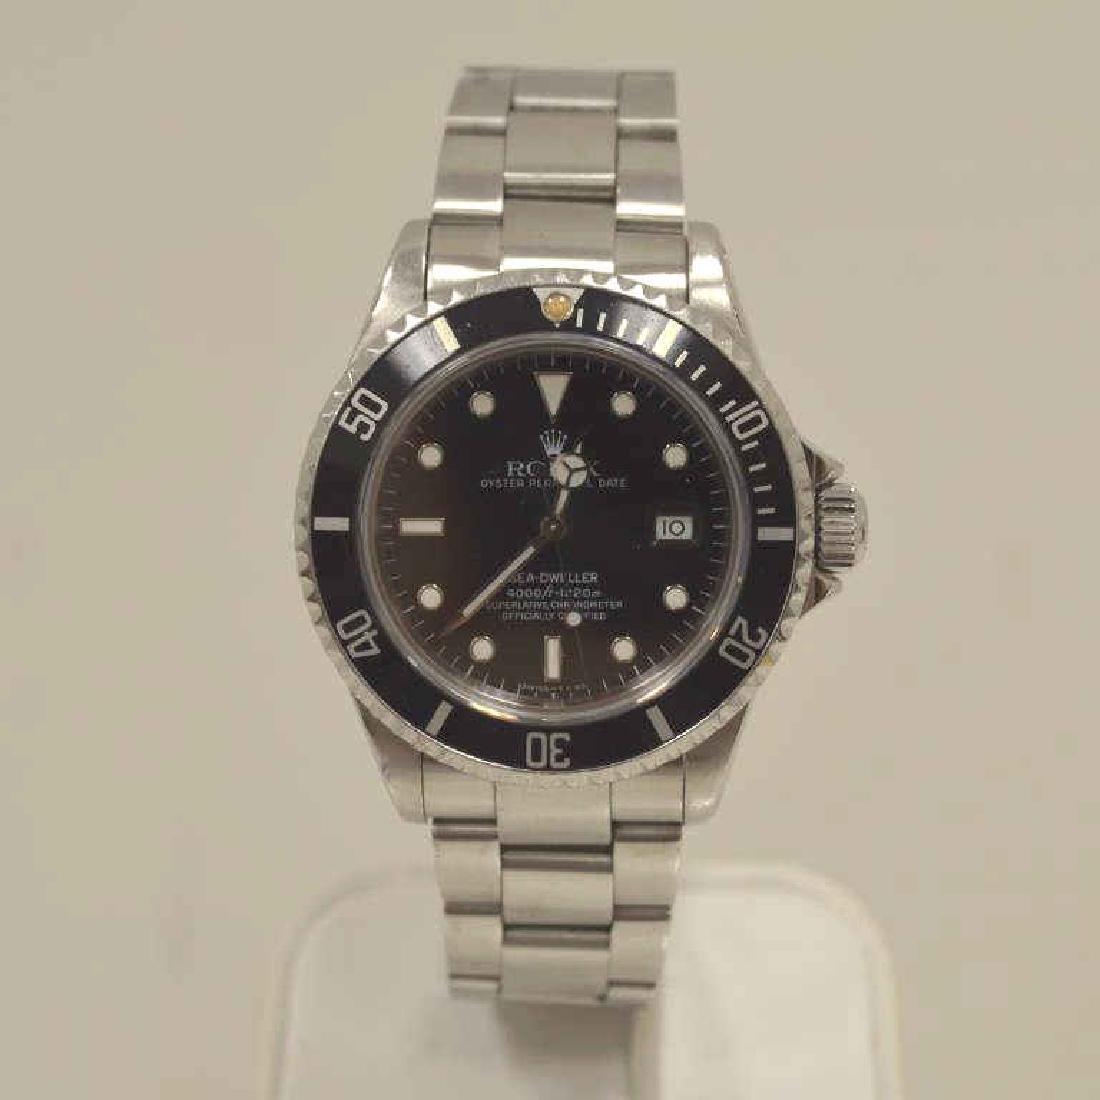 Men's Stainless Rolex Sea- Dweller watch